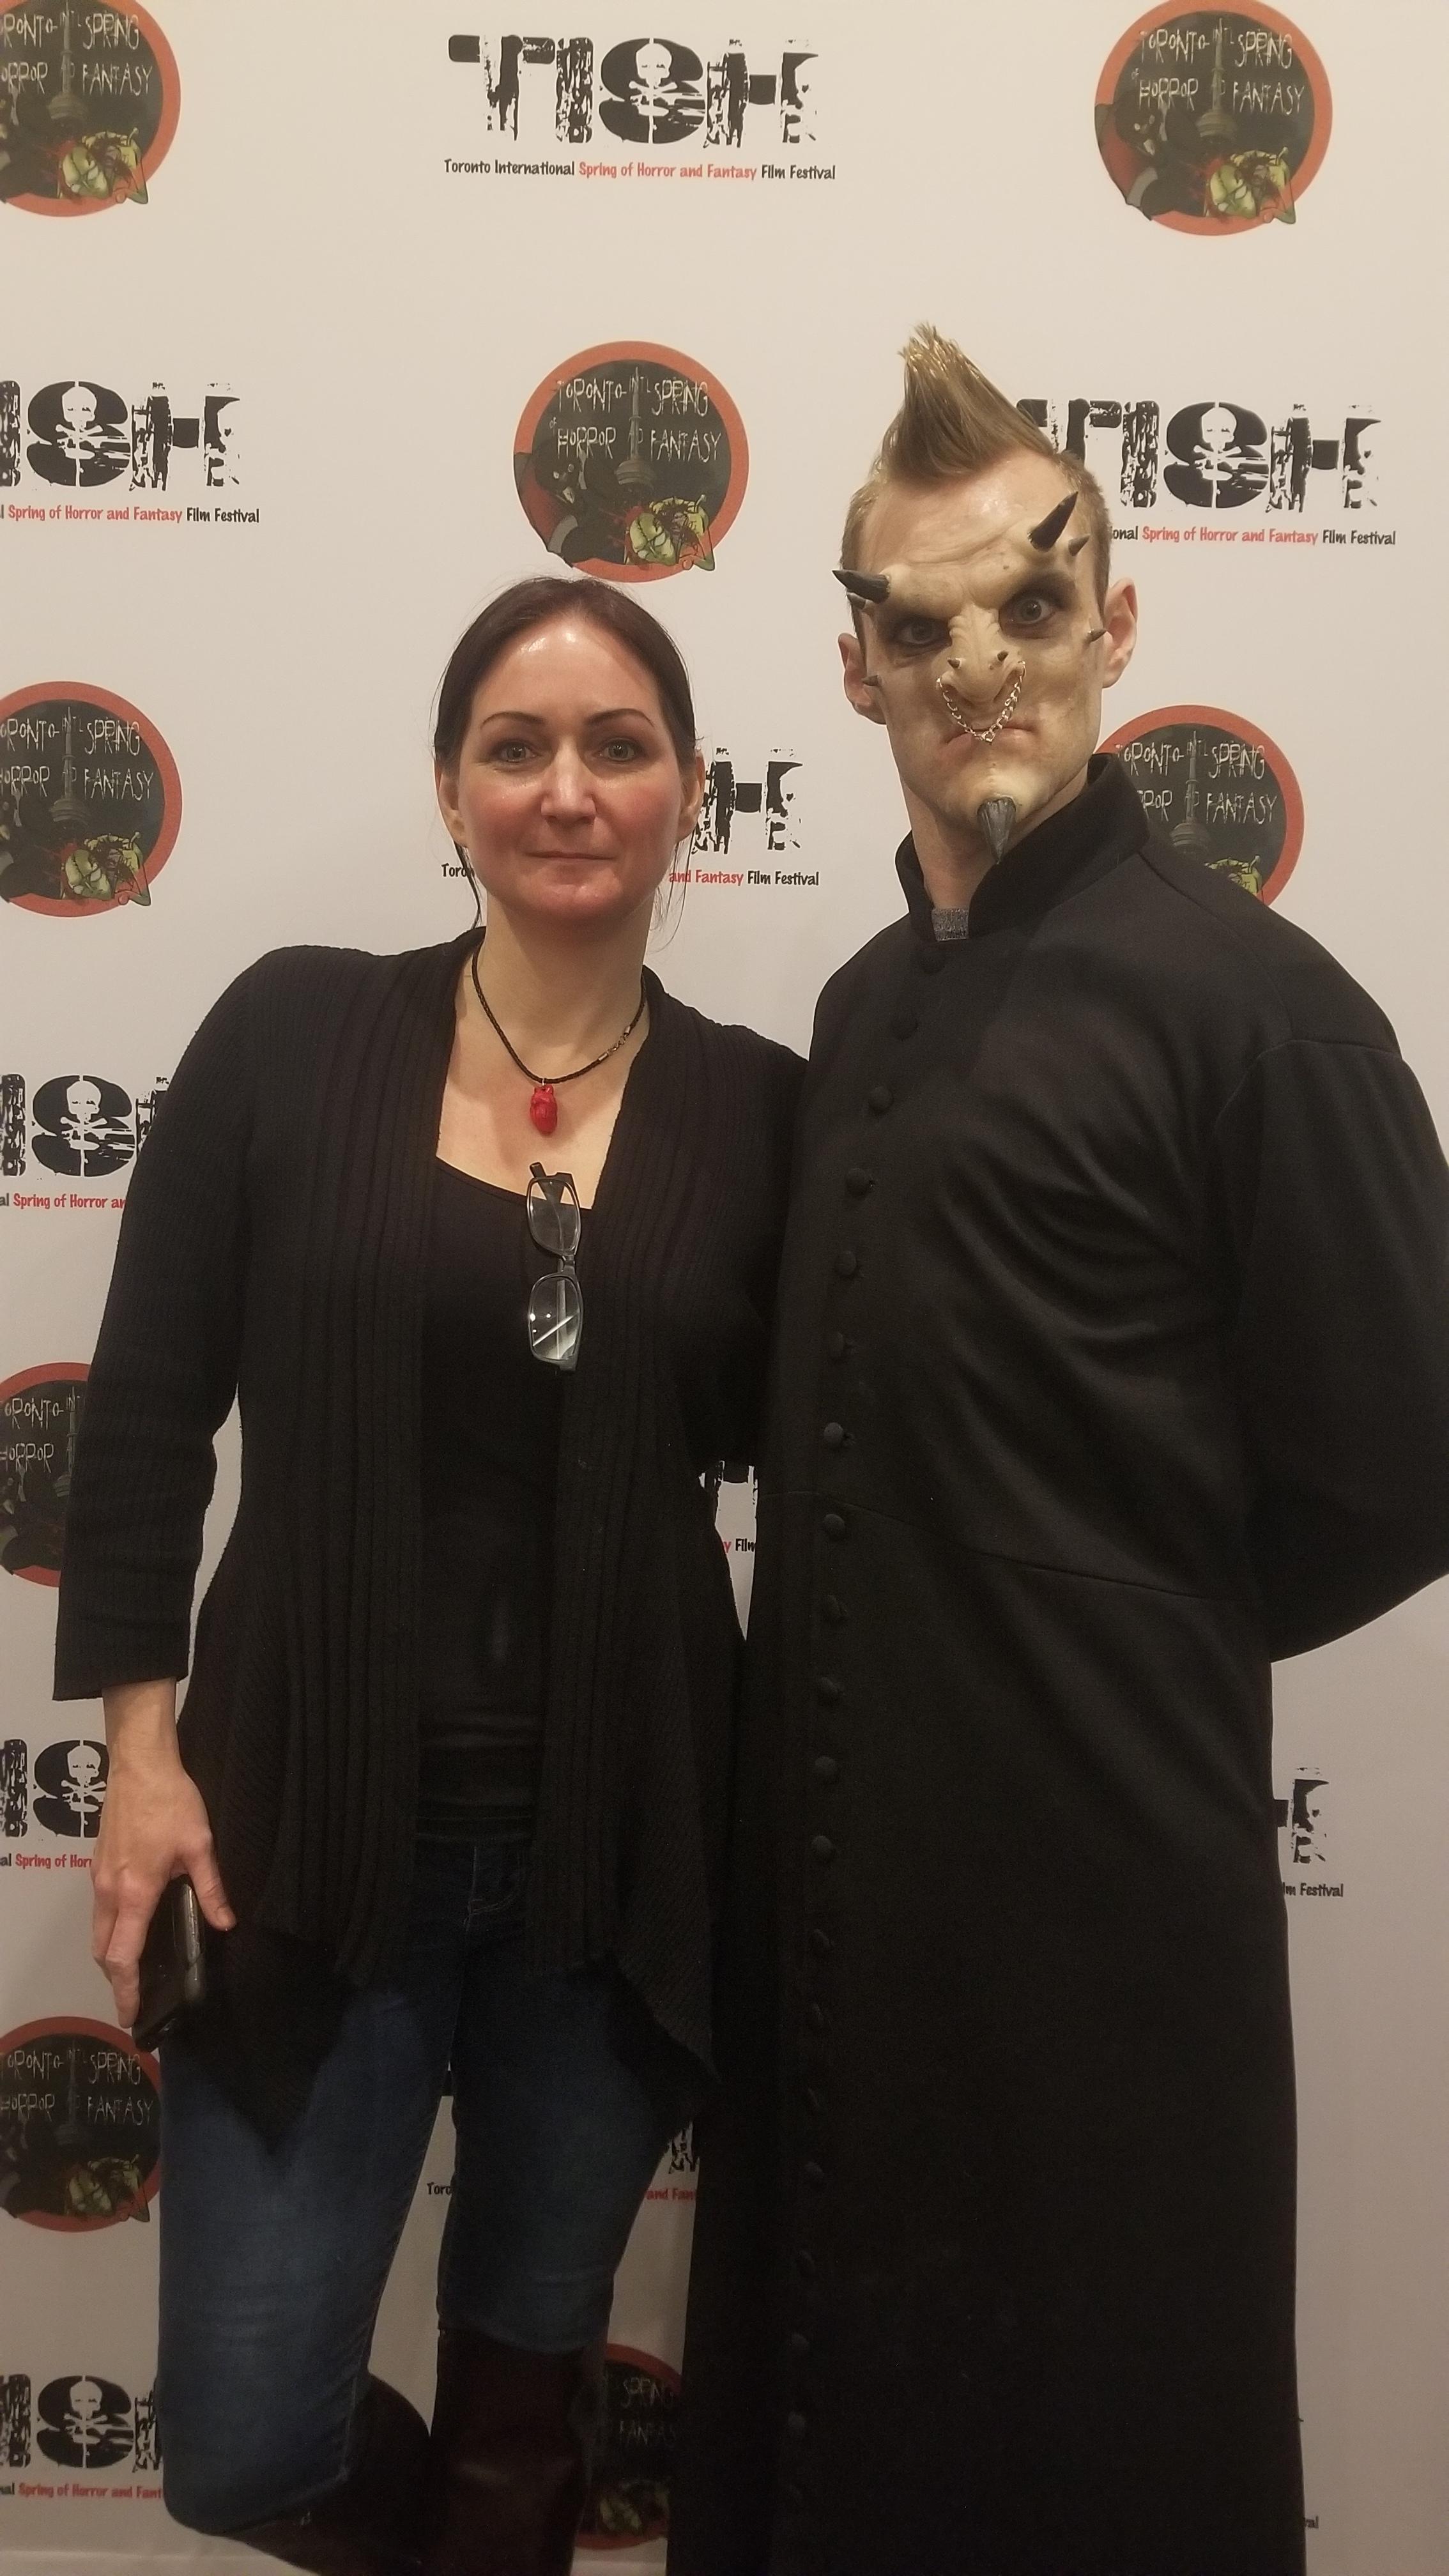 Make-Up demo at the Toronto International Spring of Horror & Fantasy Film Festival